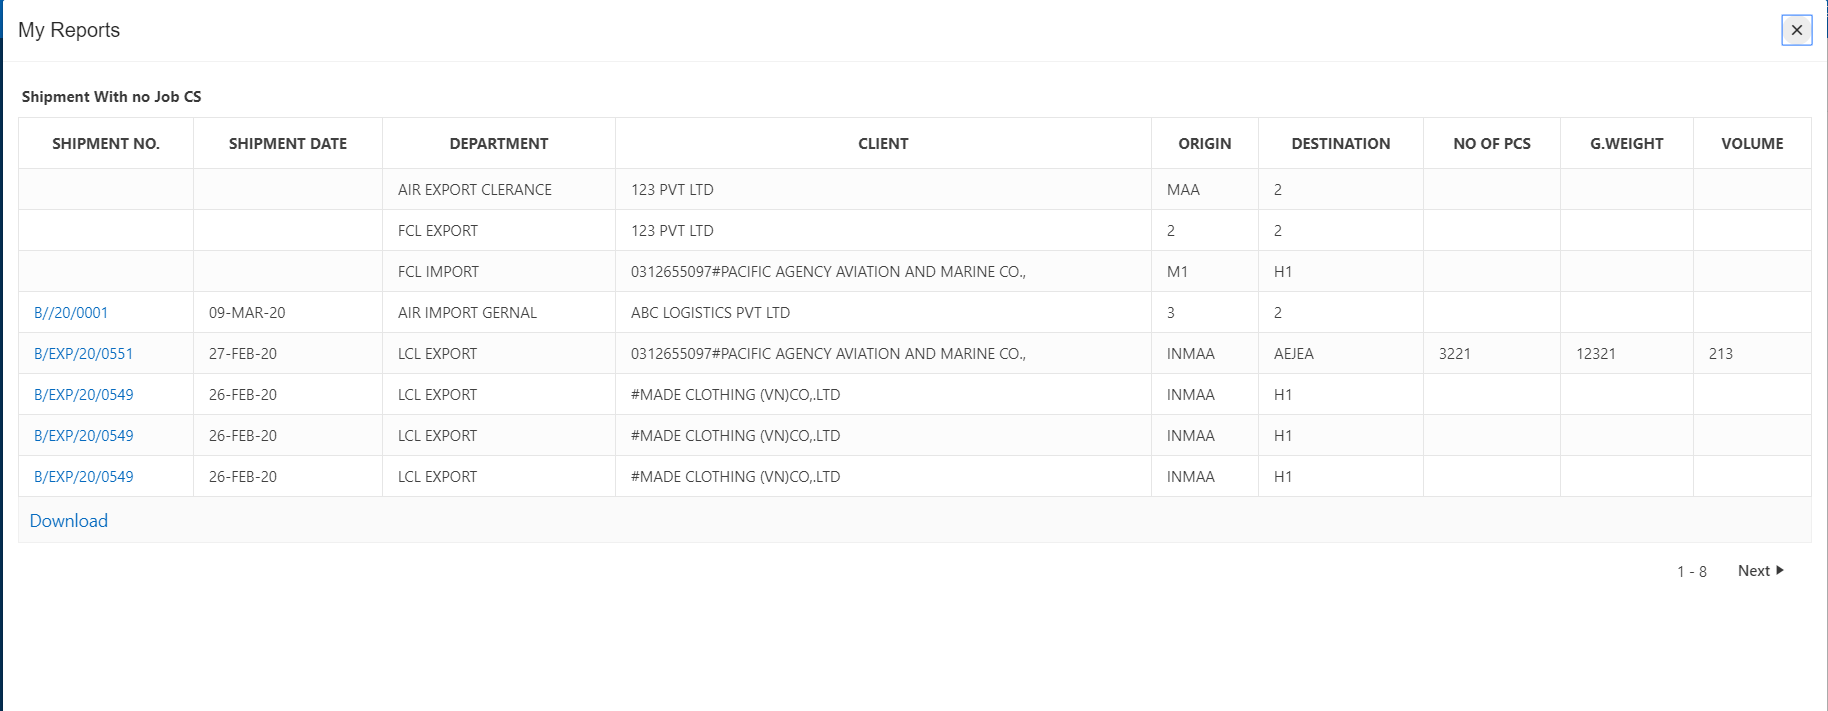 My Reports module